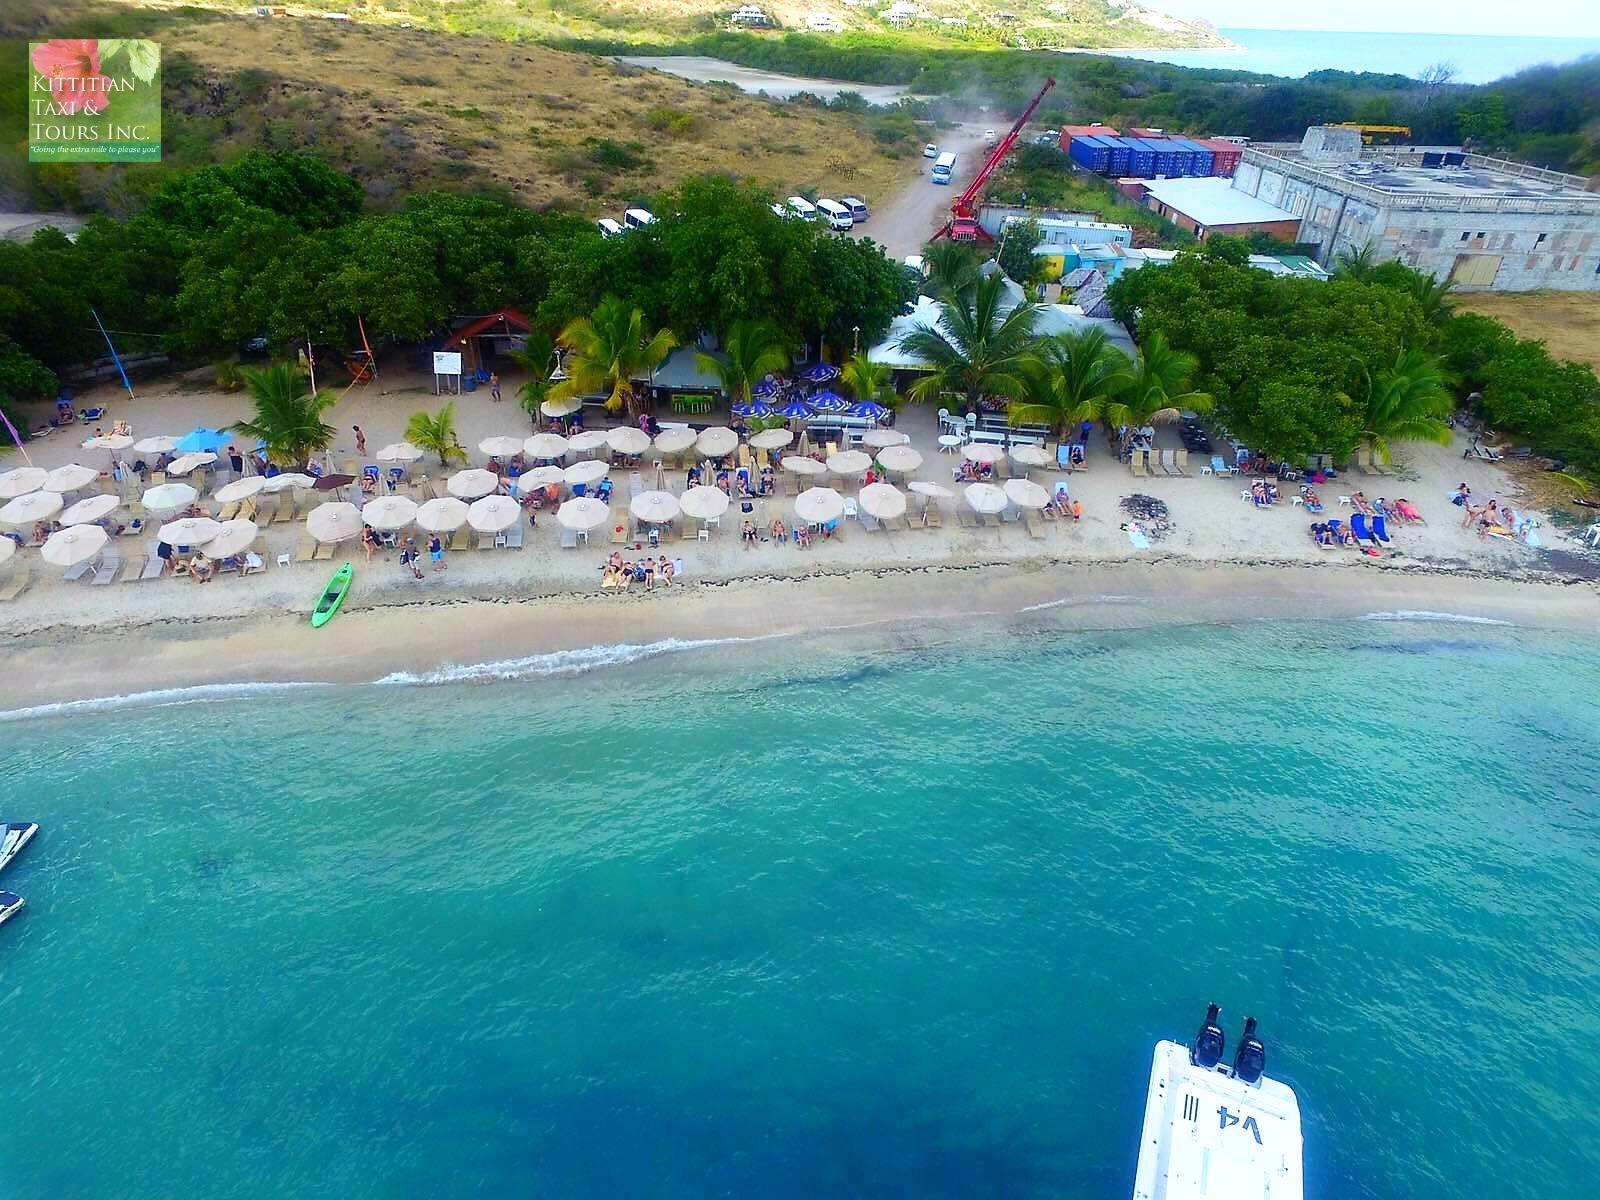 Leshell Beach In St Kitts Photo